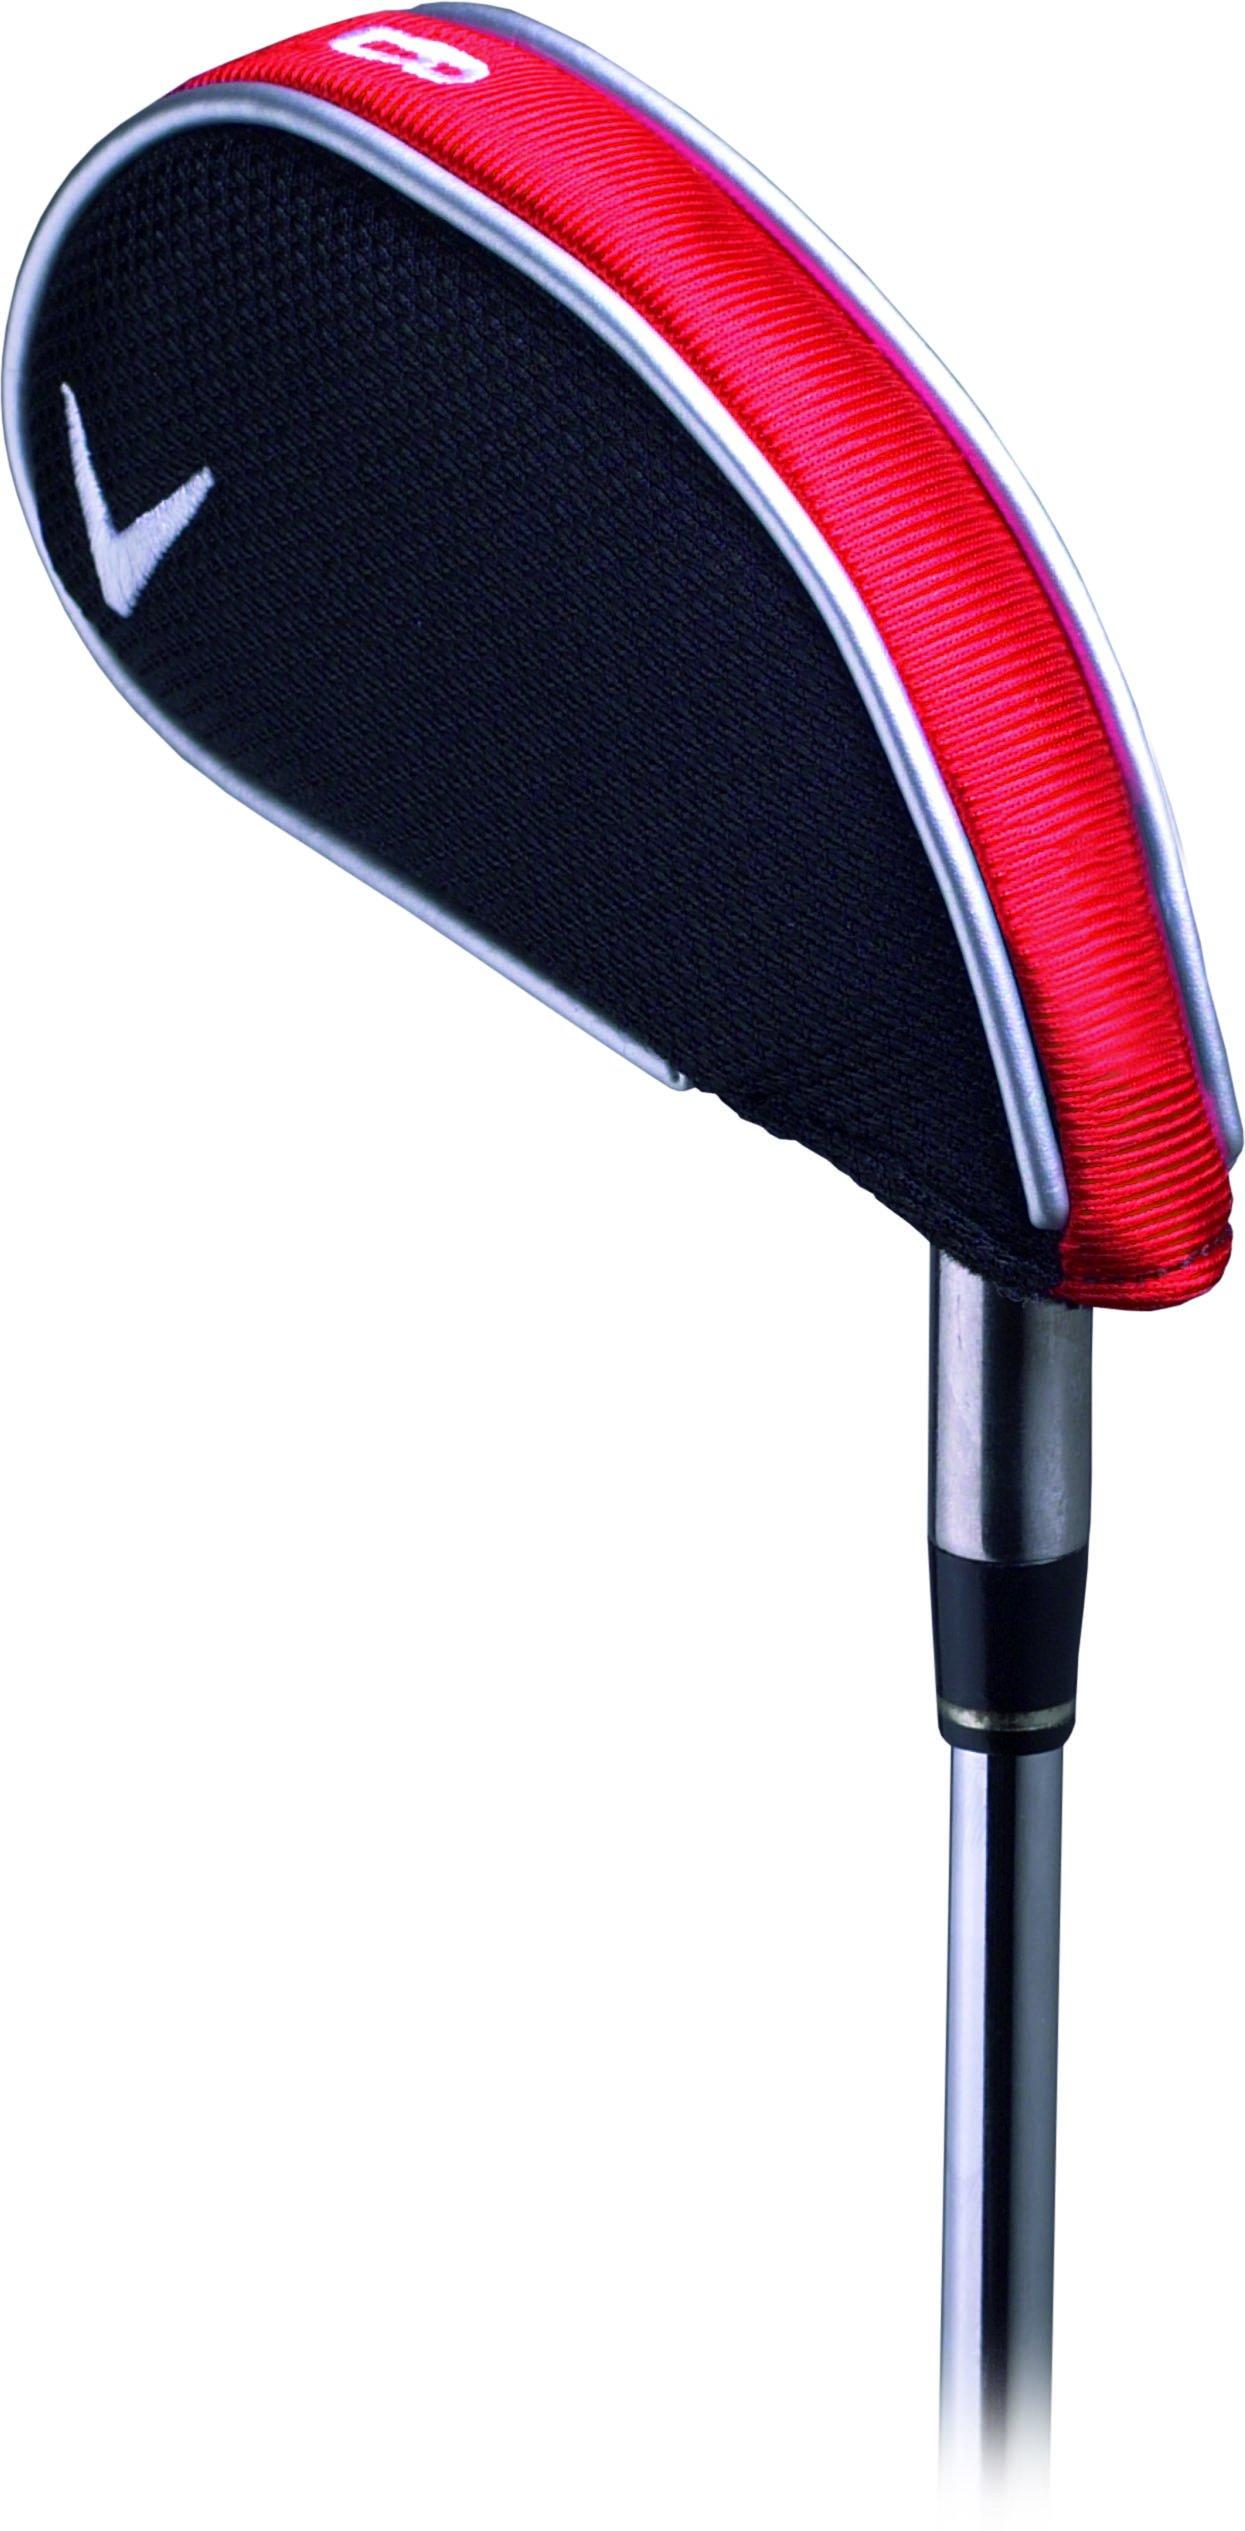 Callaway Golf Iron Headcovers, Standard C10730,Red by Callaway Golf